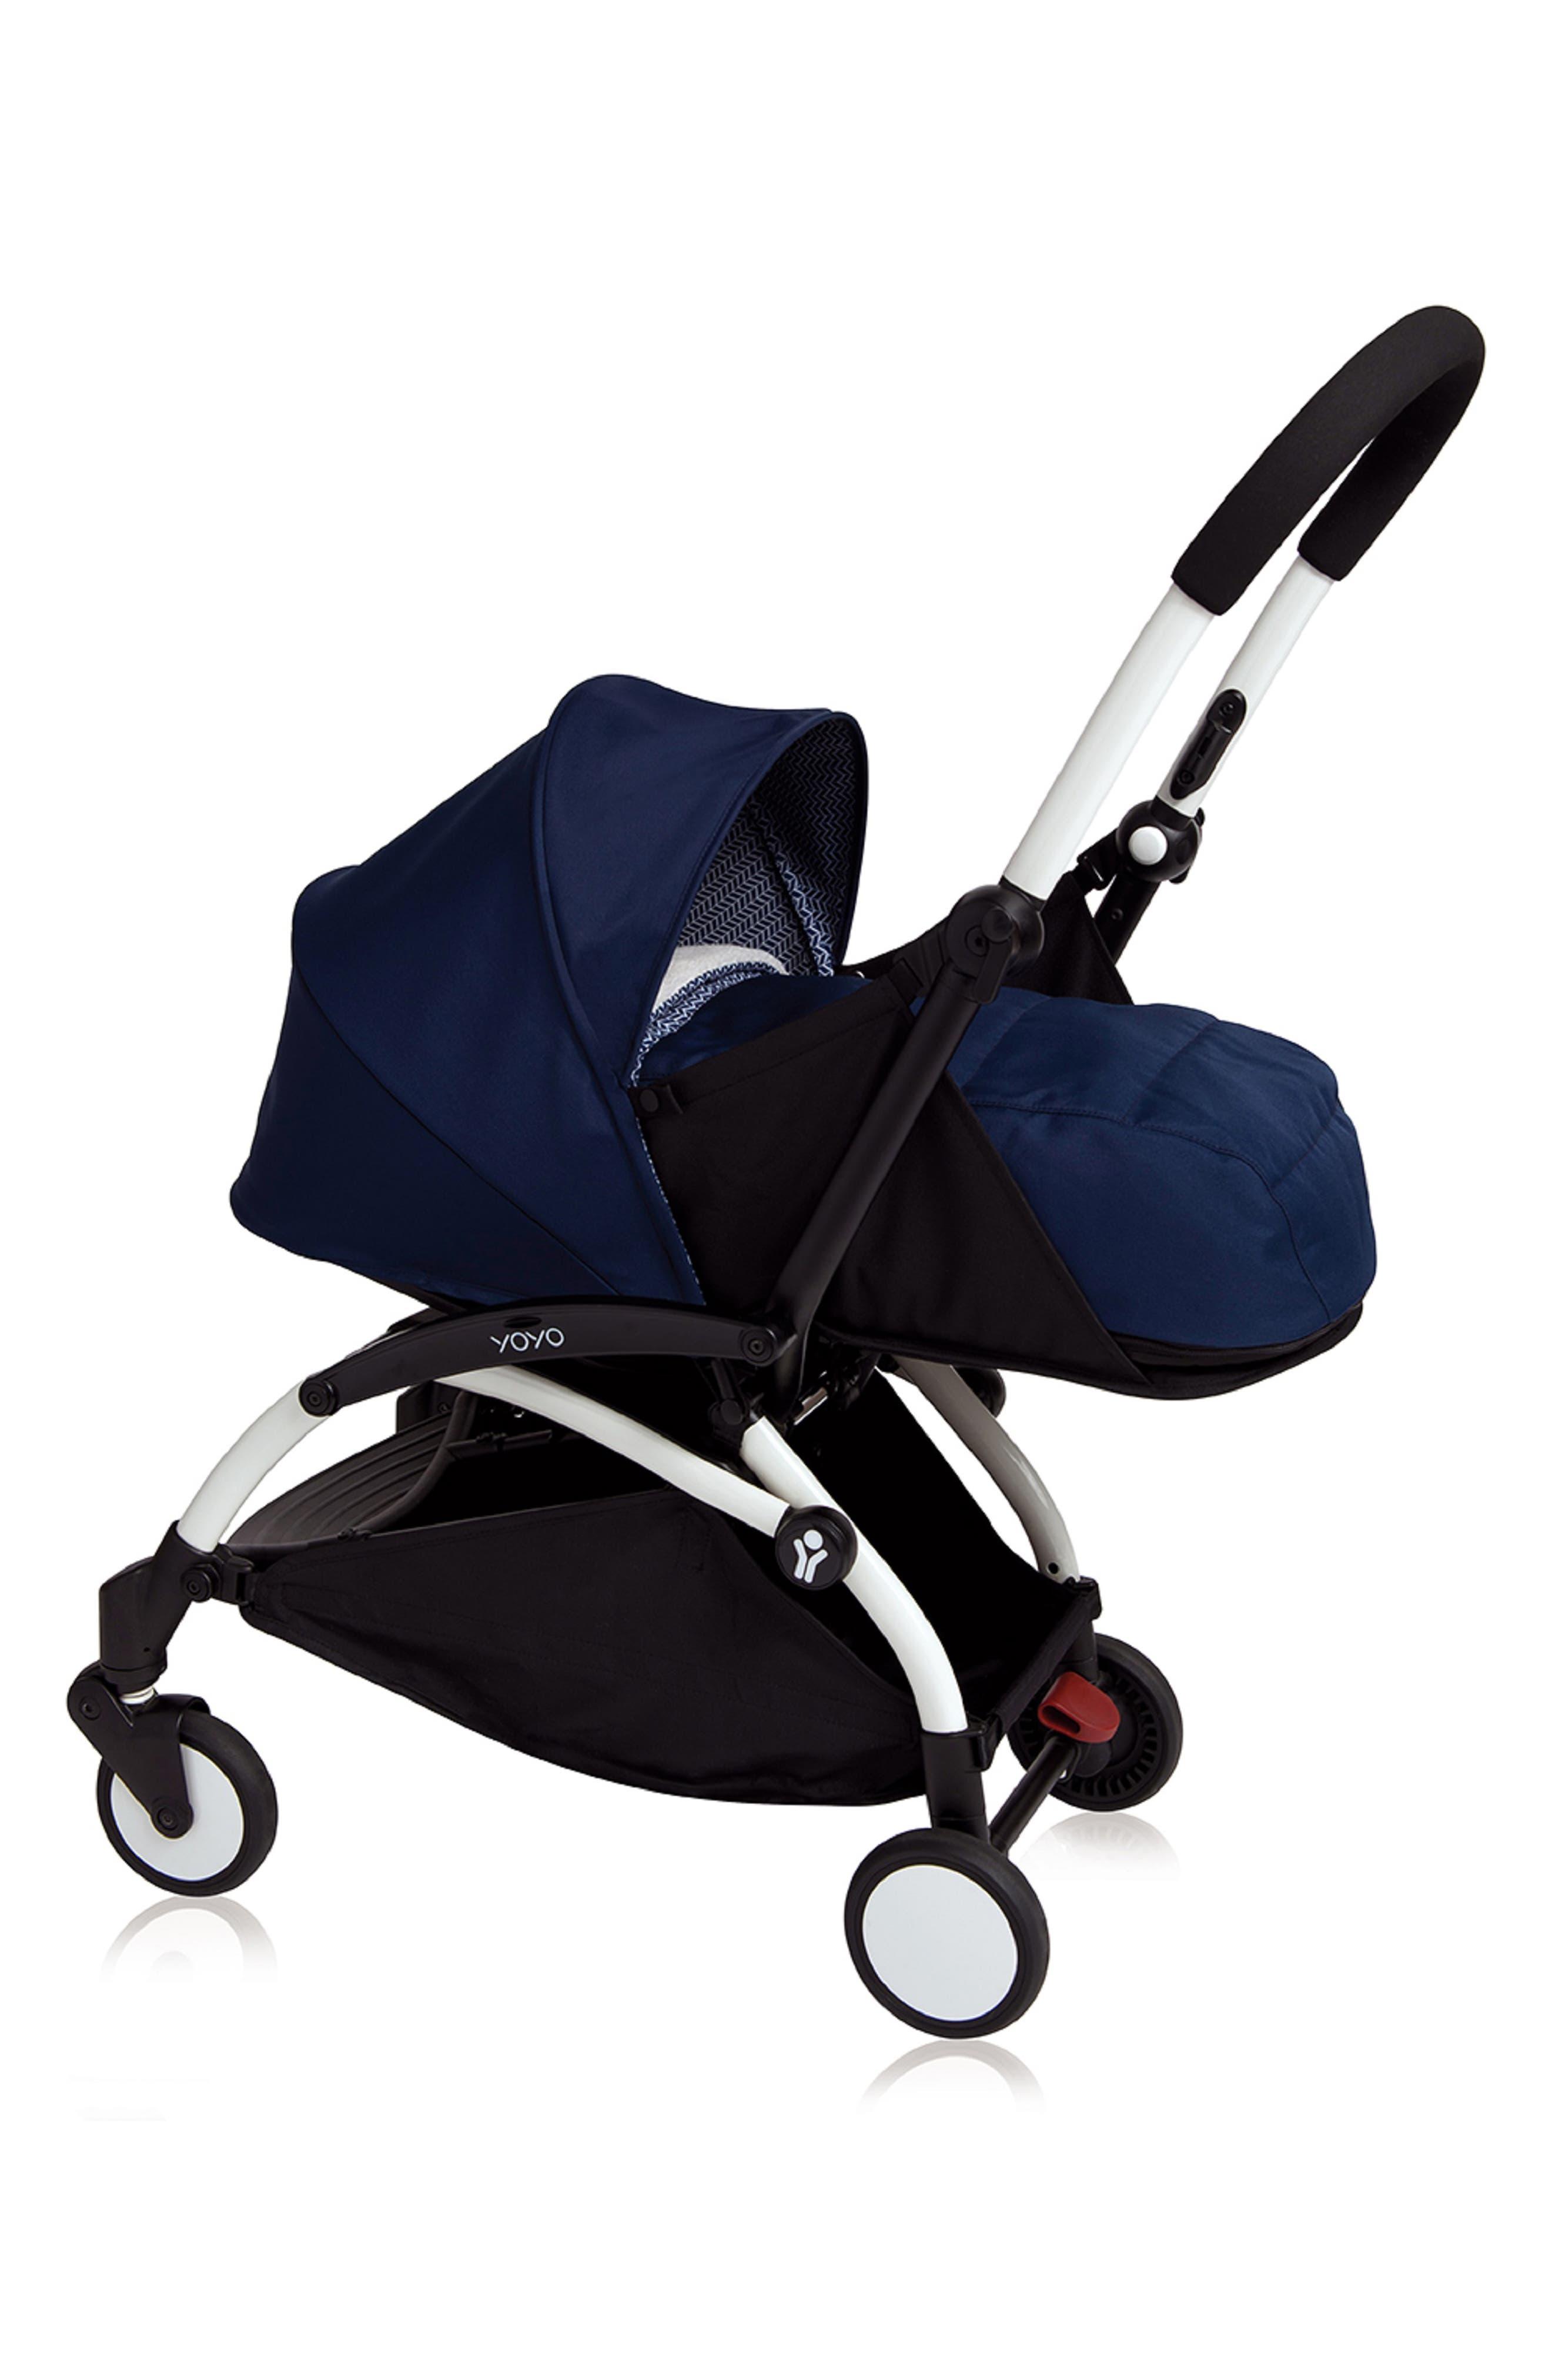 YOYO+ Newborn Stroller Frame,                         Main,                         color, WHITE/ AIR FRANCE NAVY